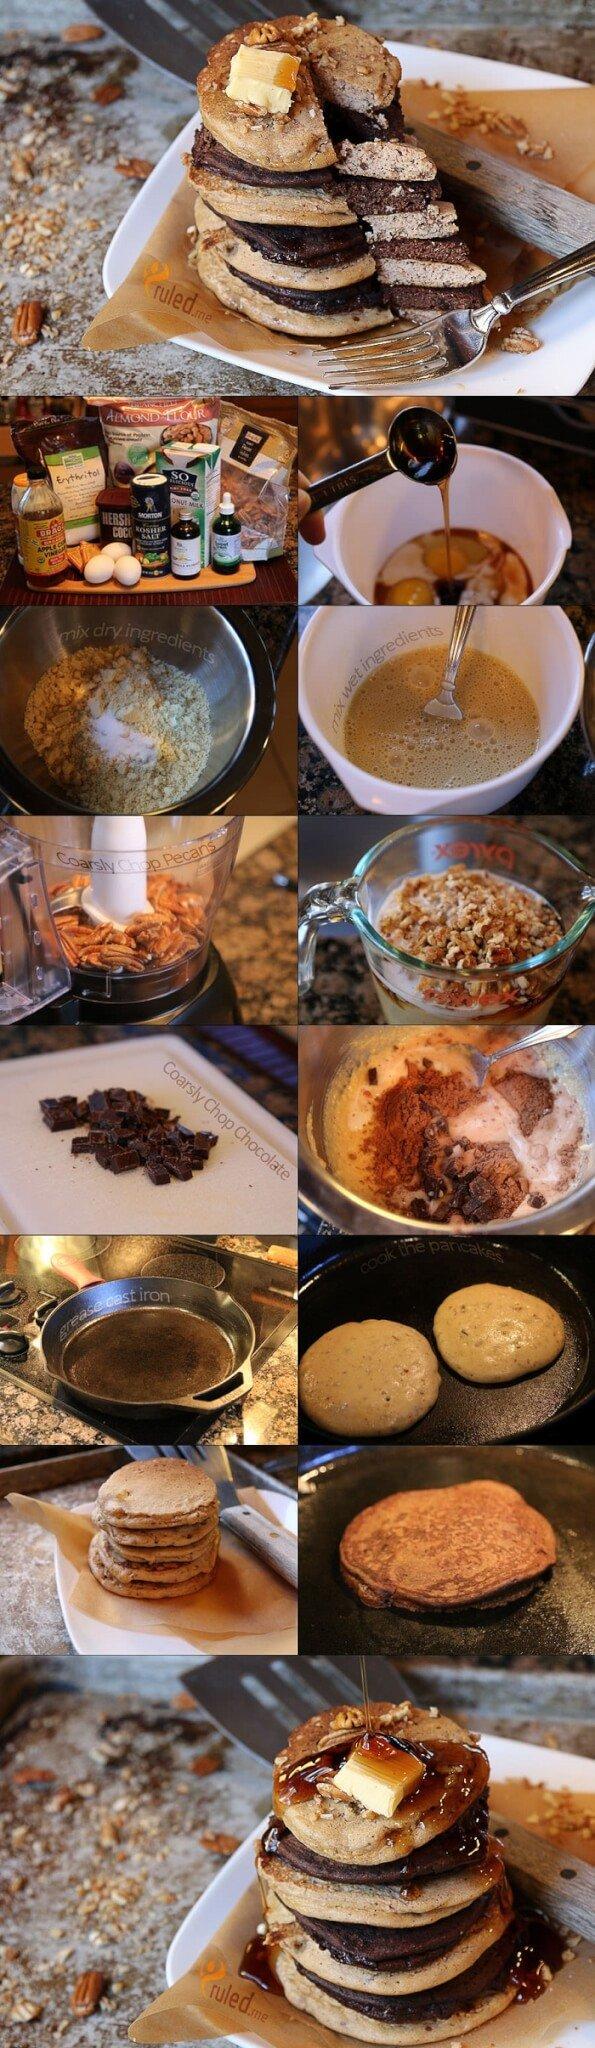 Keto Pancake Recipe Instructions